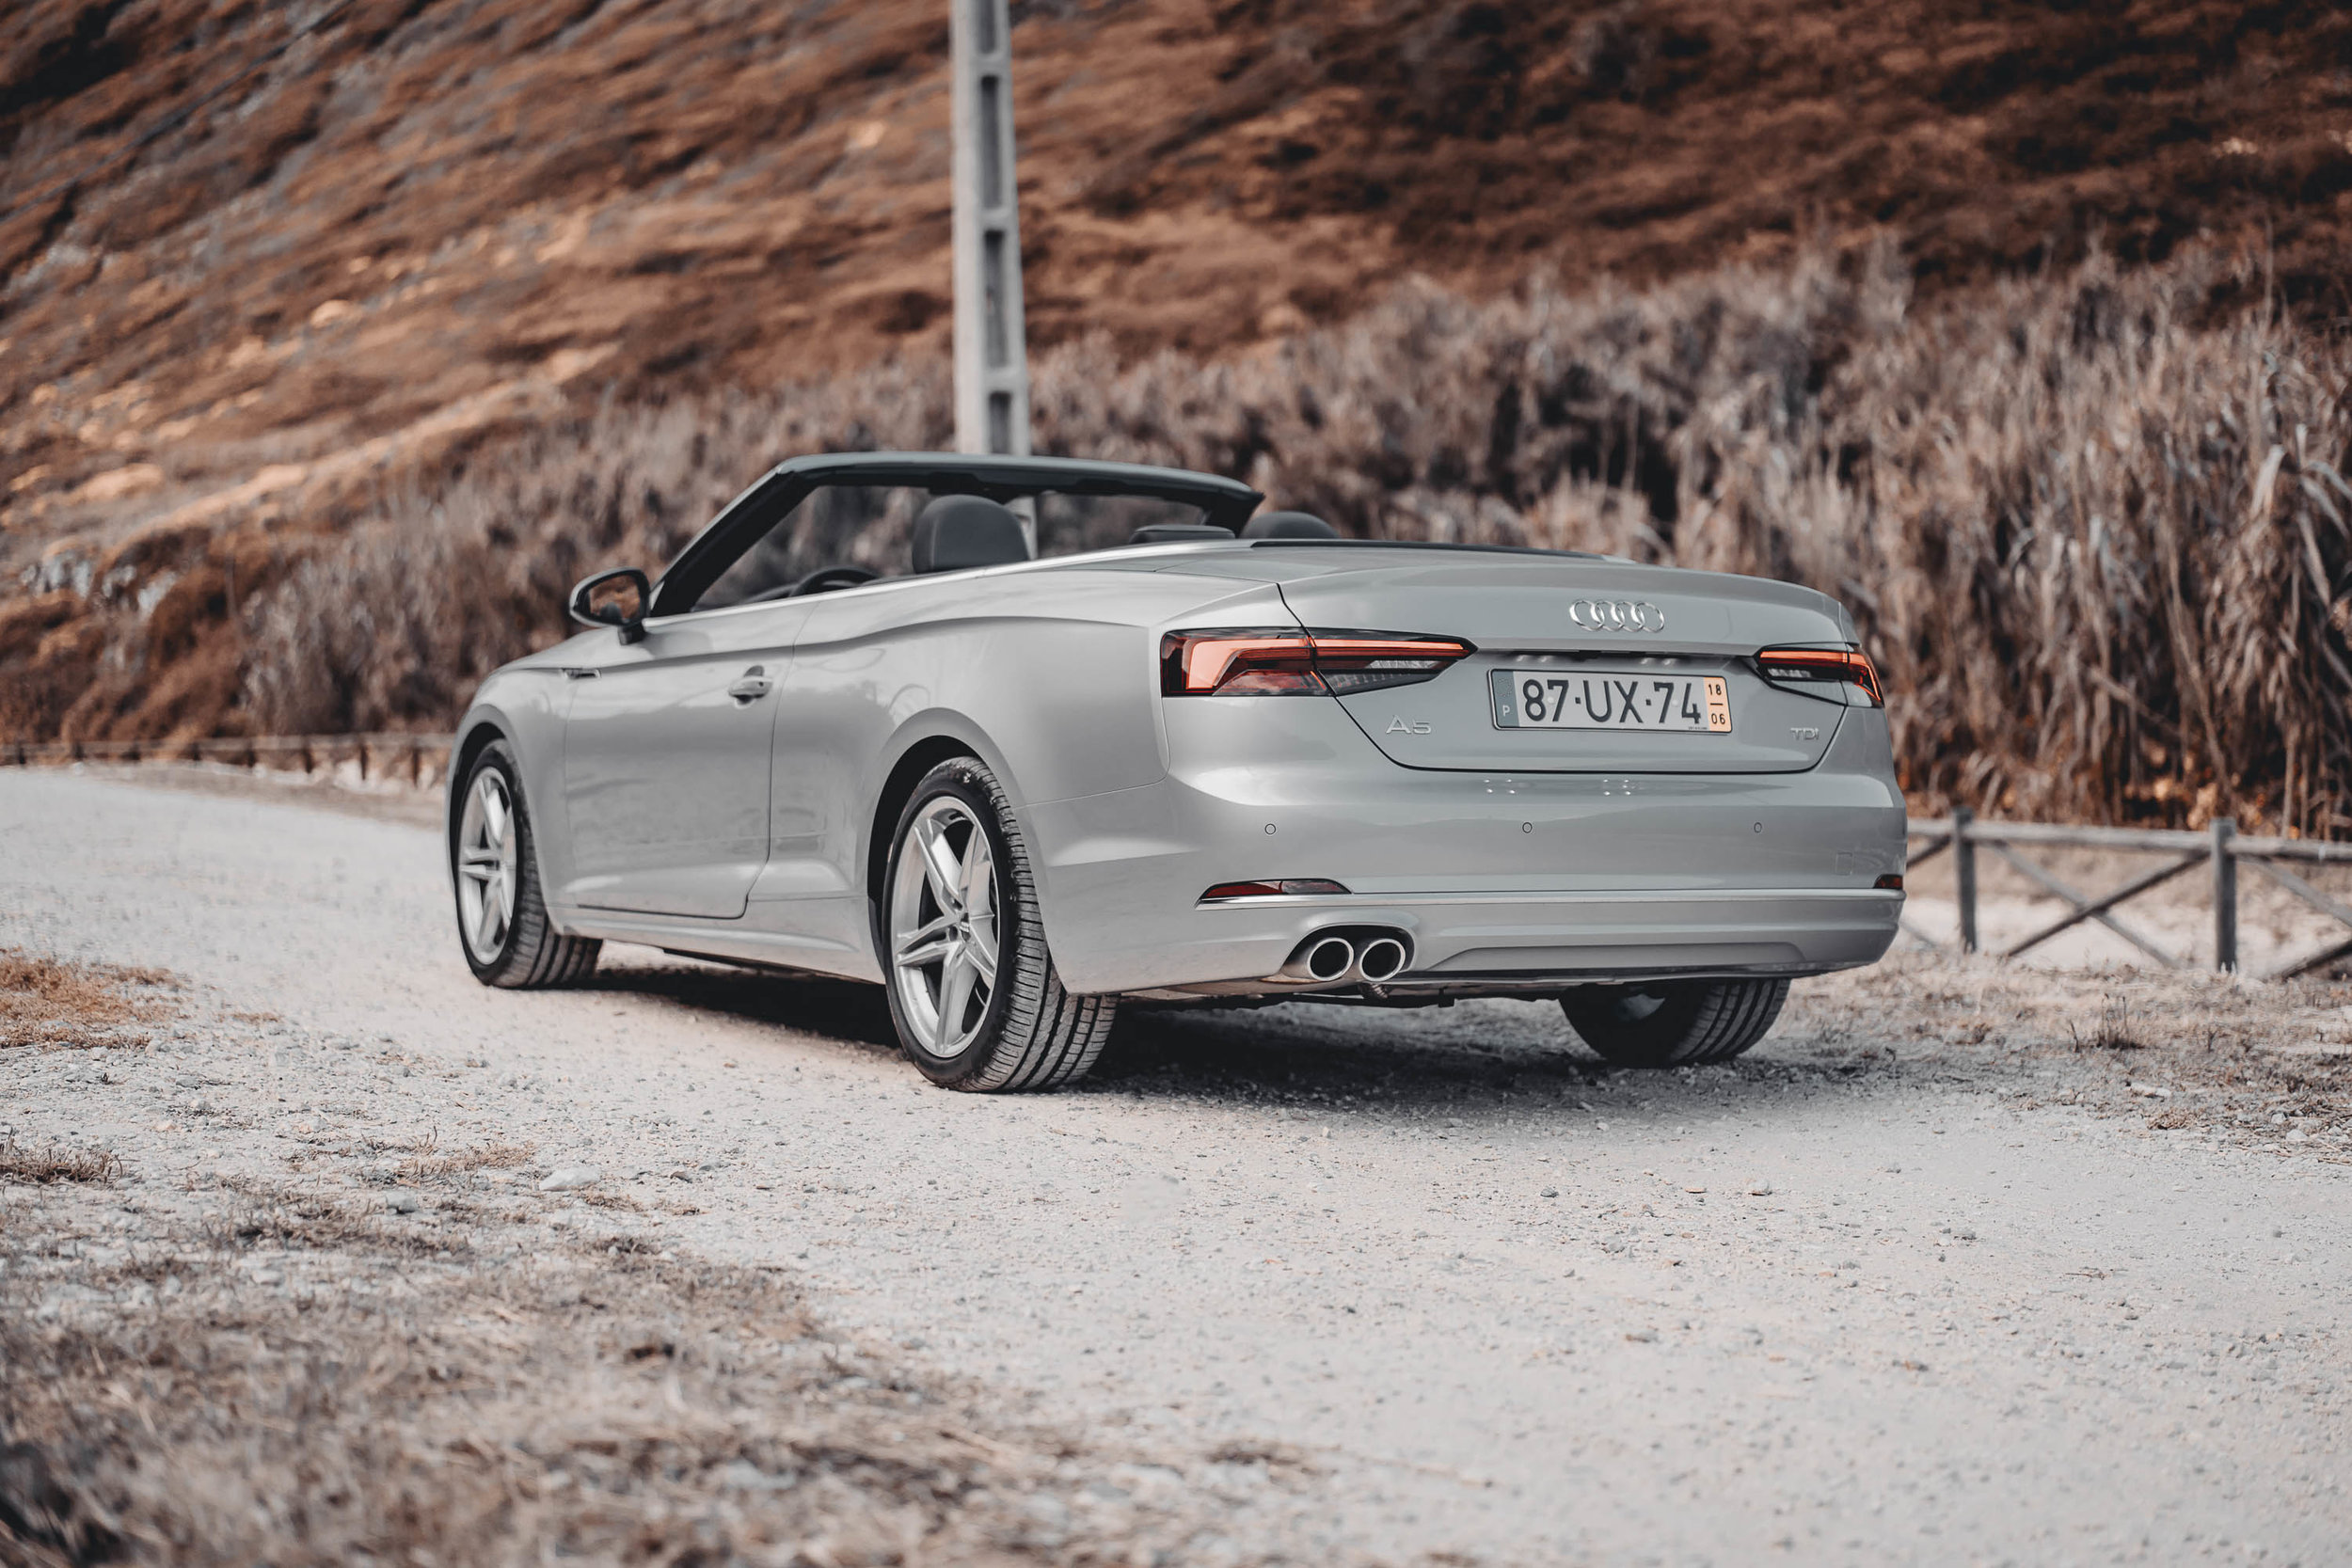 Maximilian_Otto_Audi_A5_Cabriolet_Portugal_14_WEB.jpg